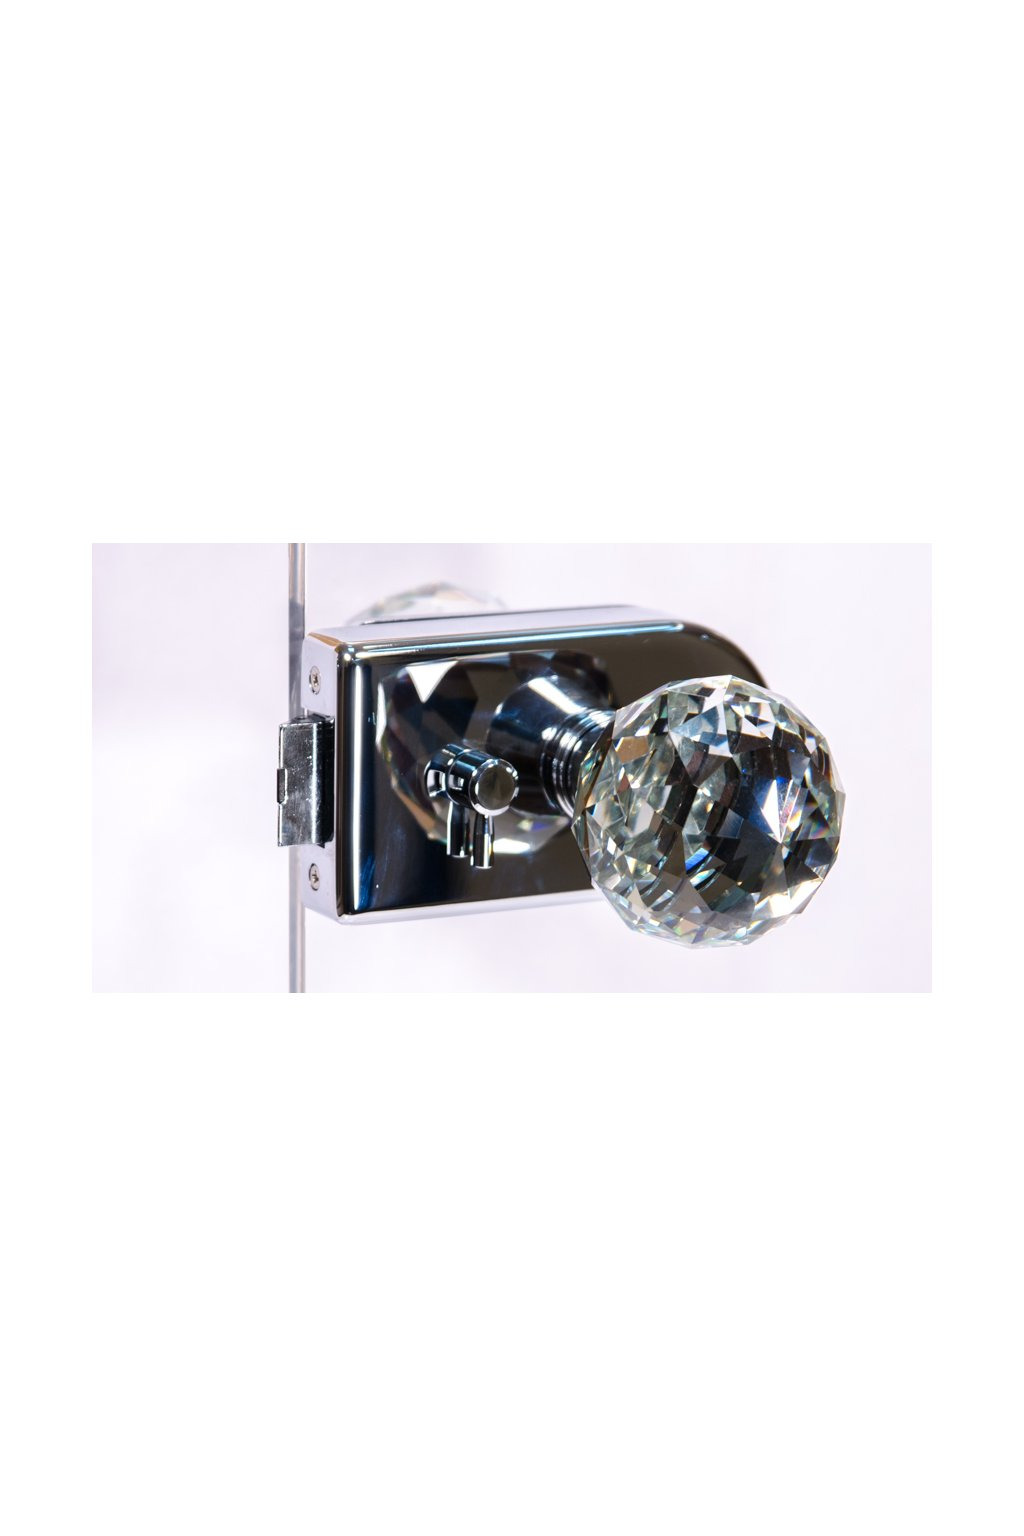 Onyx Krystal B6025 Glass